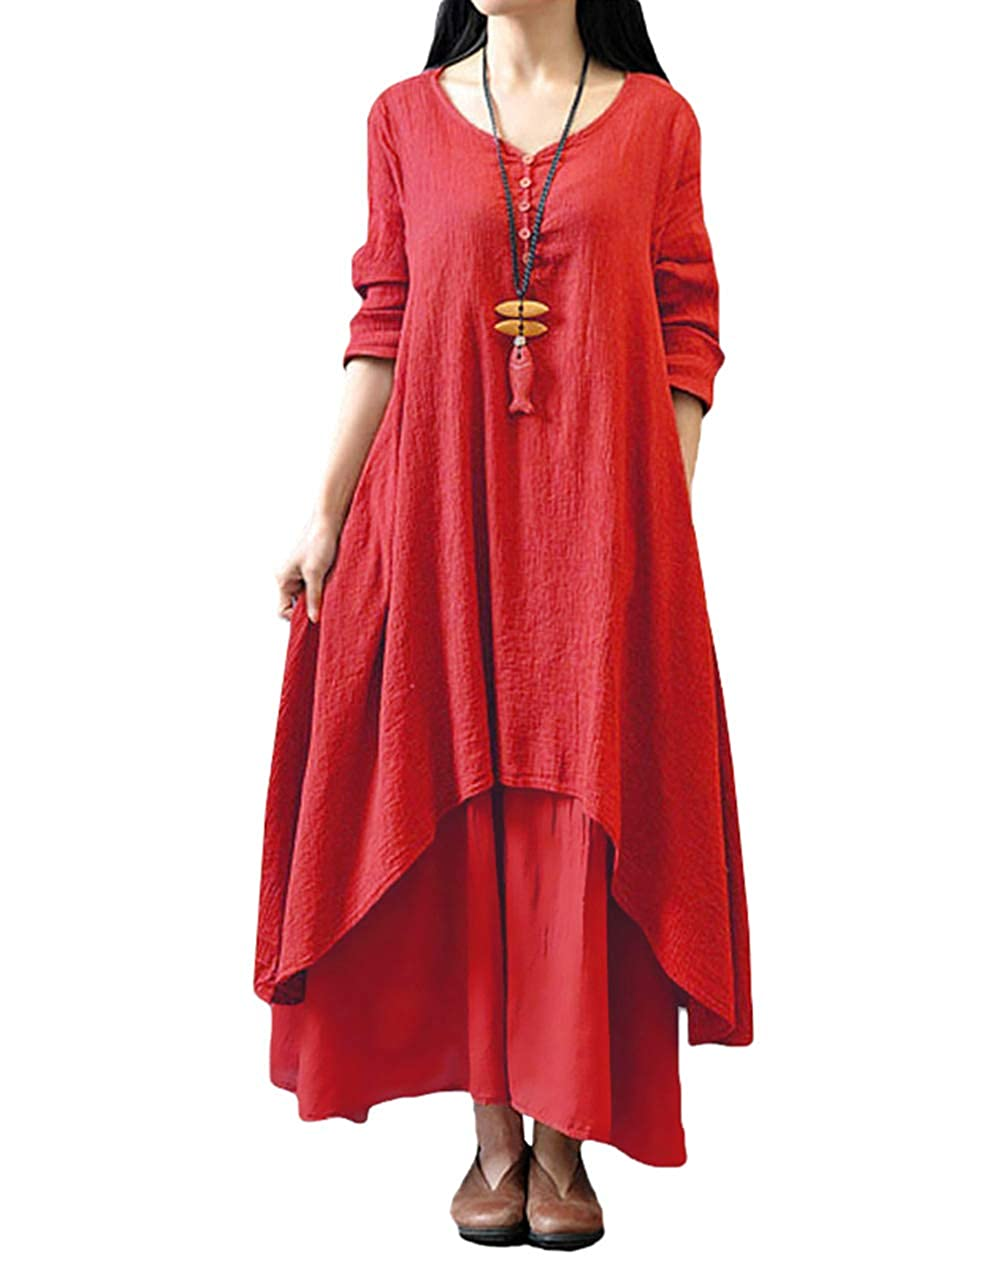 TALLA XL. Romacci Vestido Suelto Vestido Ocasional de Las Mujeres Manga Larga Sólida Maxi Vestido Largo de Boho Rojo XL